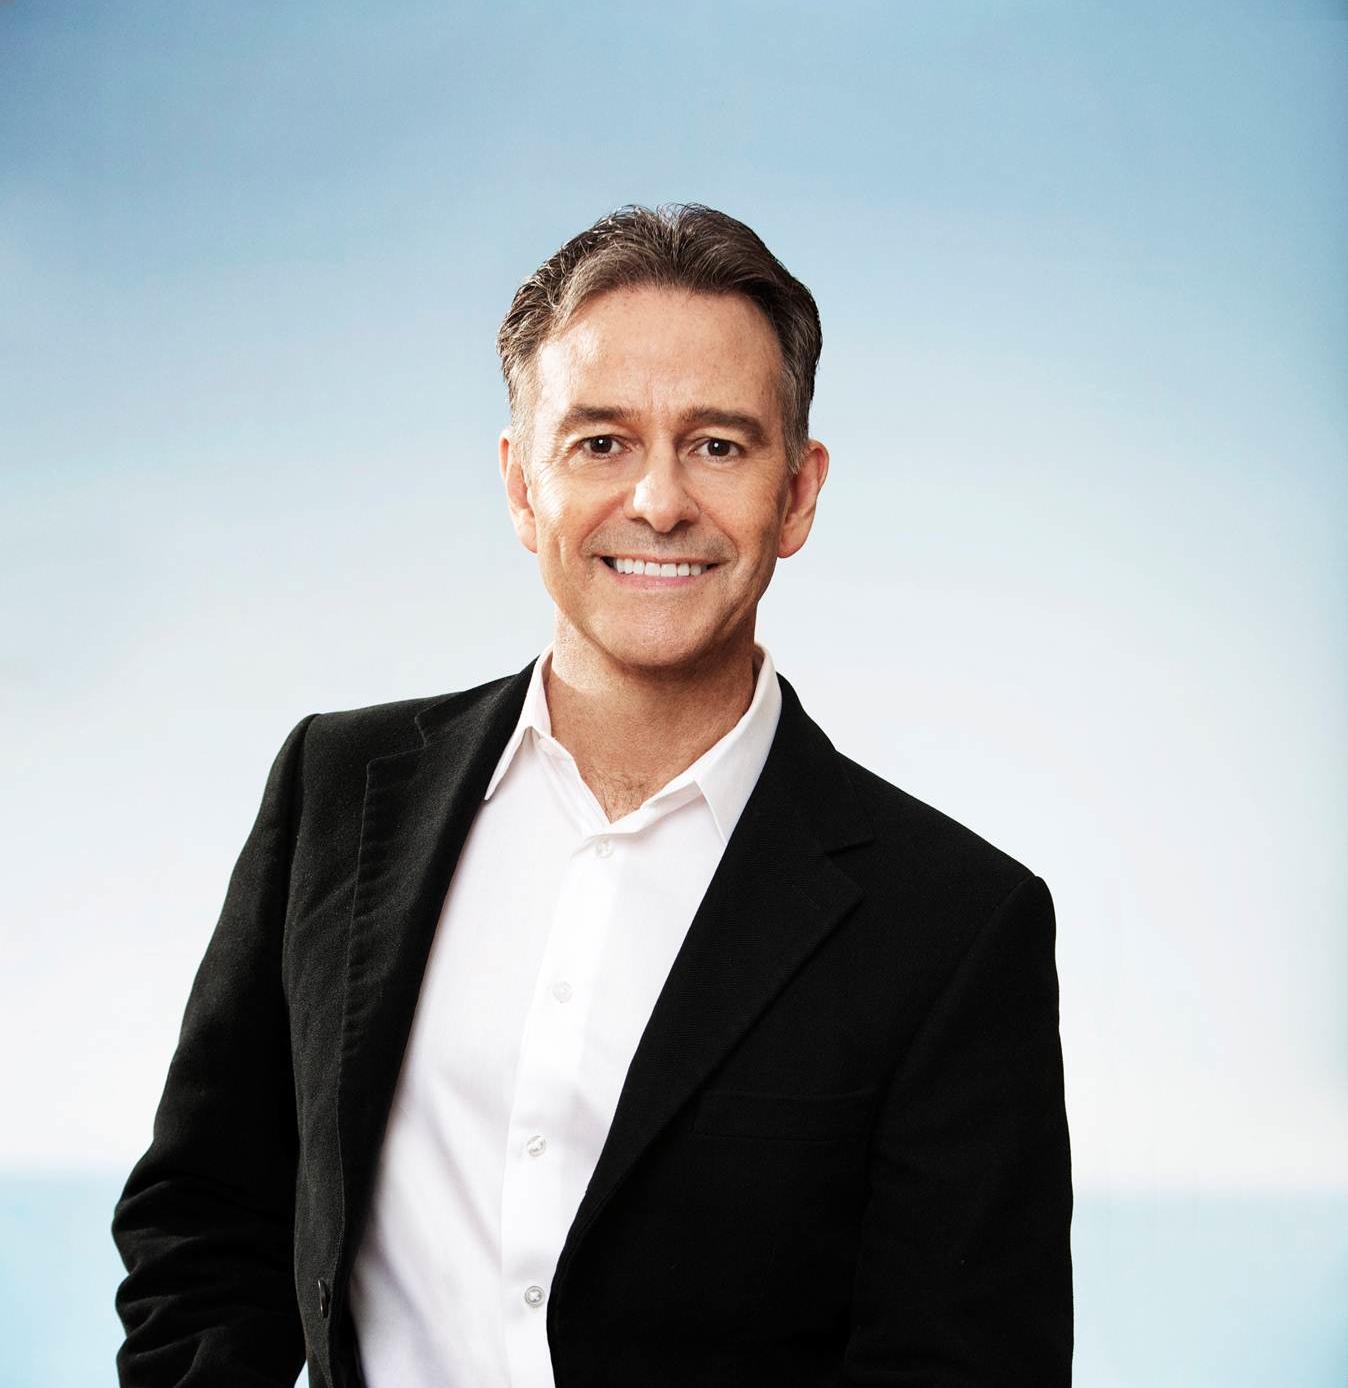 An Entrepreneur's Journey: New Podcast Features Founder of Malibu Wellness, Tom Porter